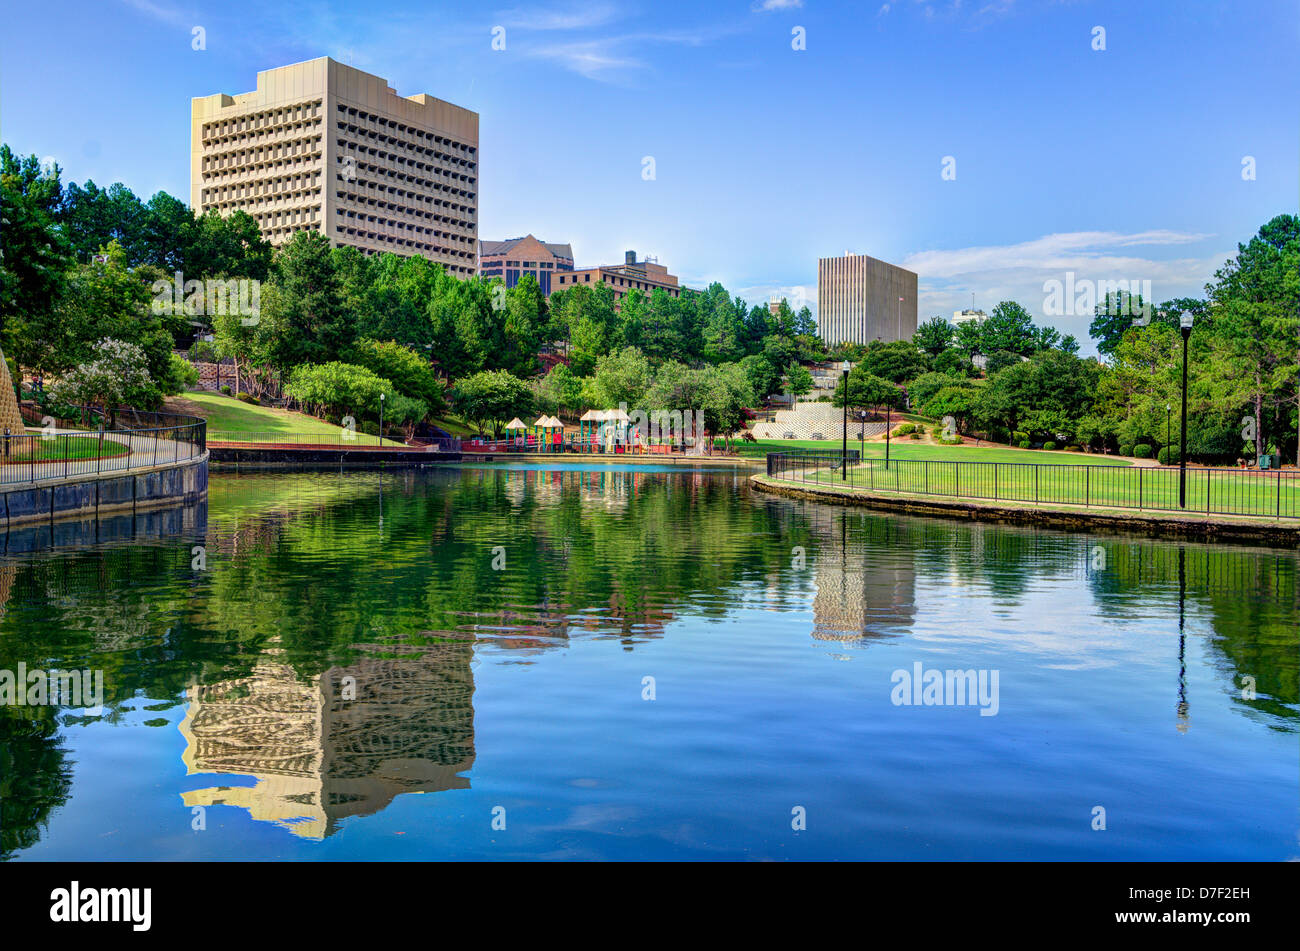 Finlay Park in Columbia, South Carolina. - Stock Image